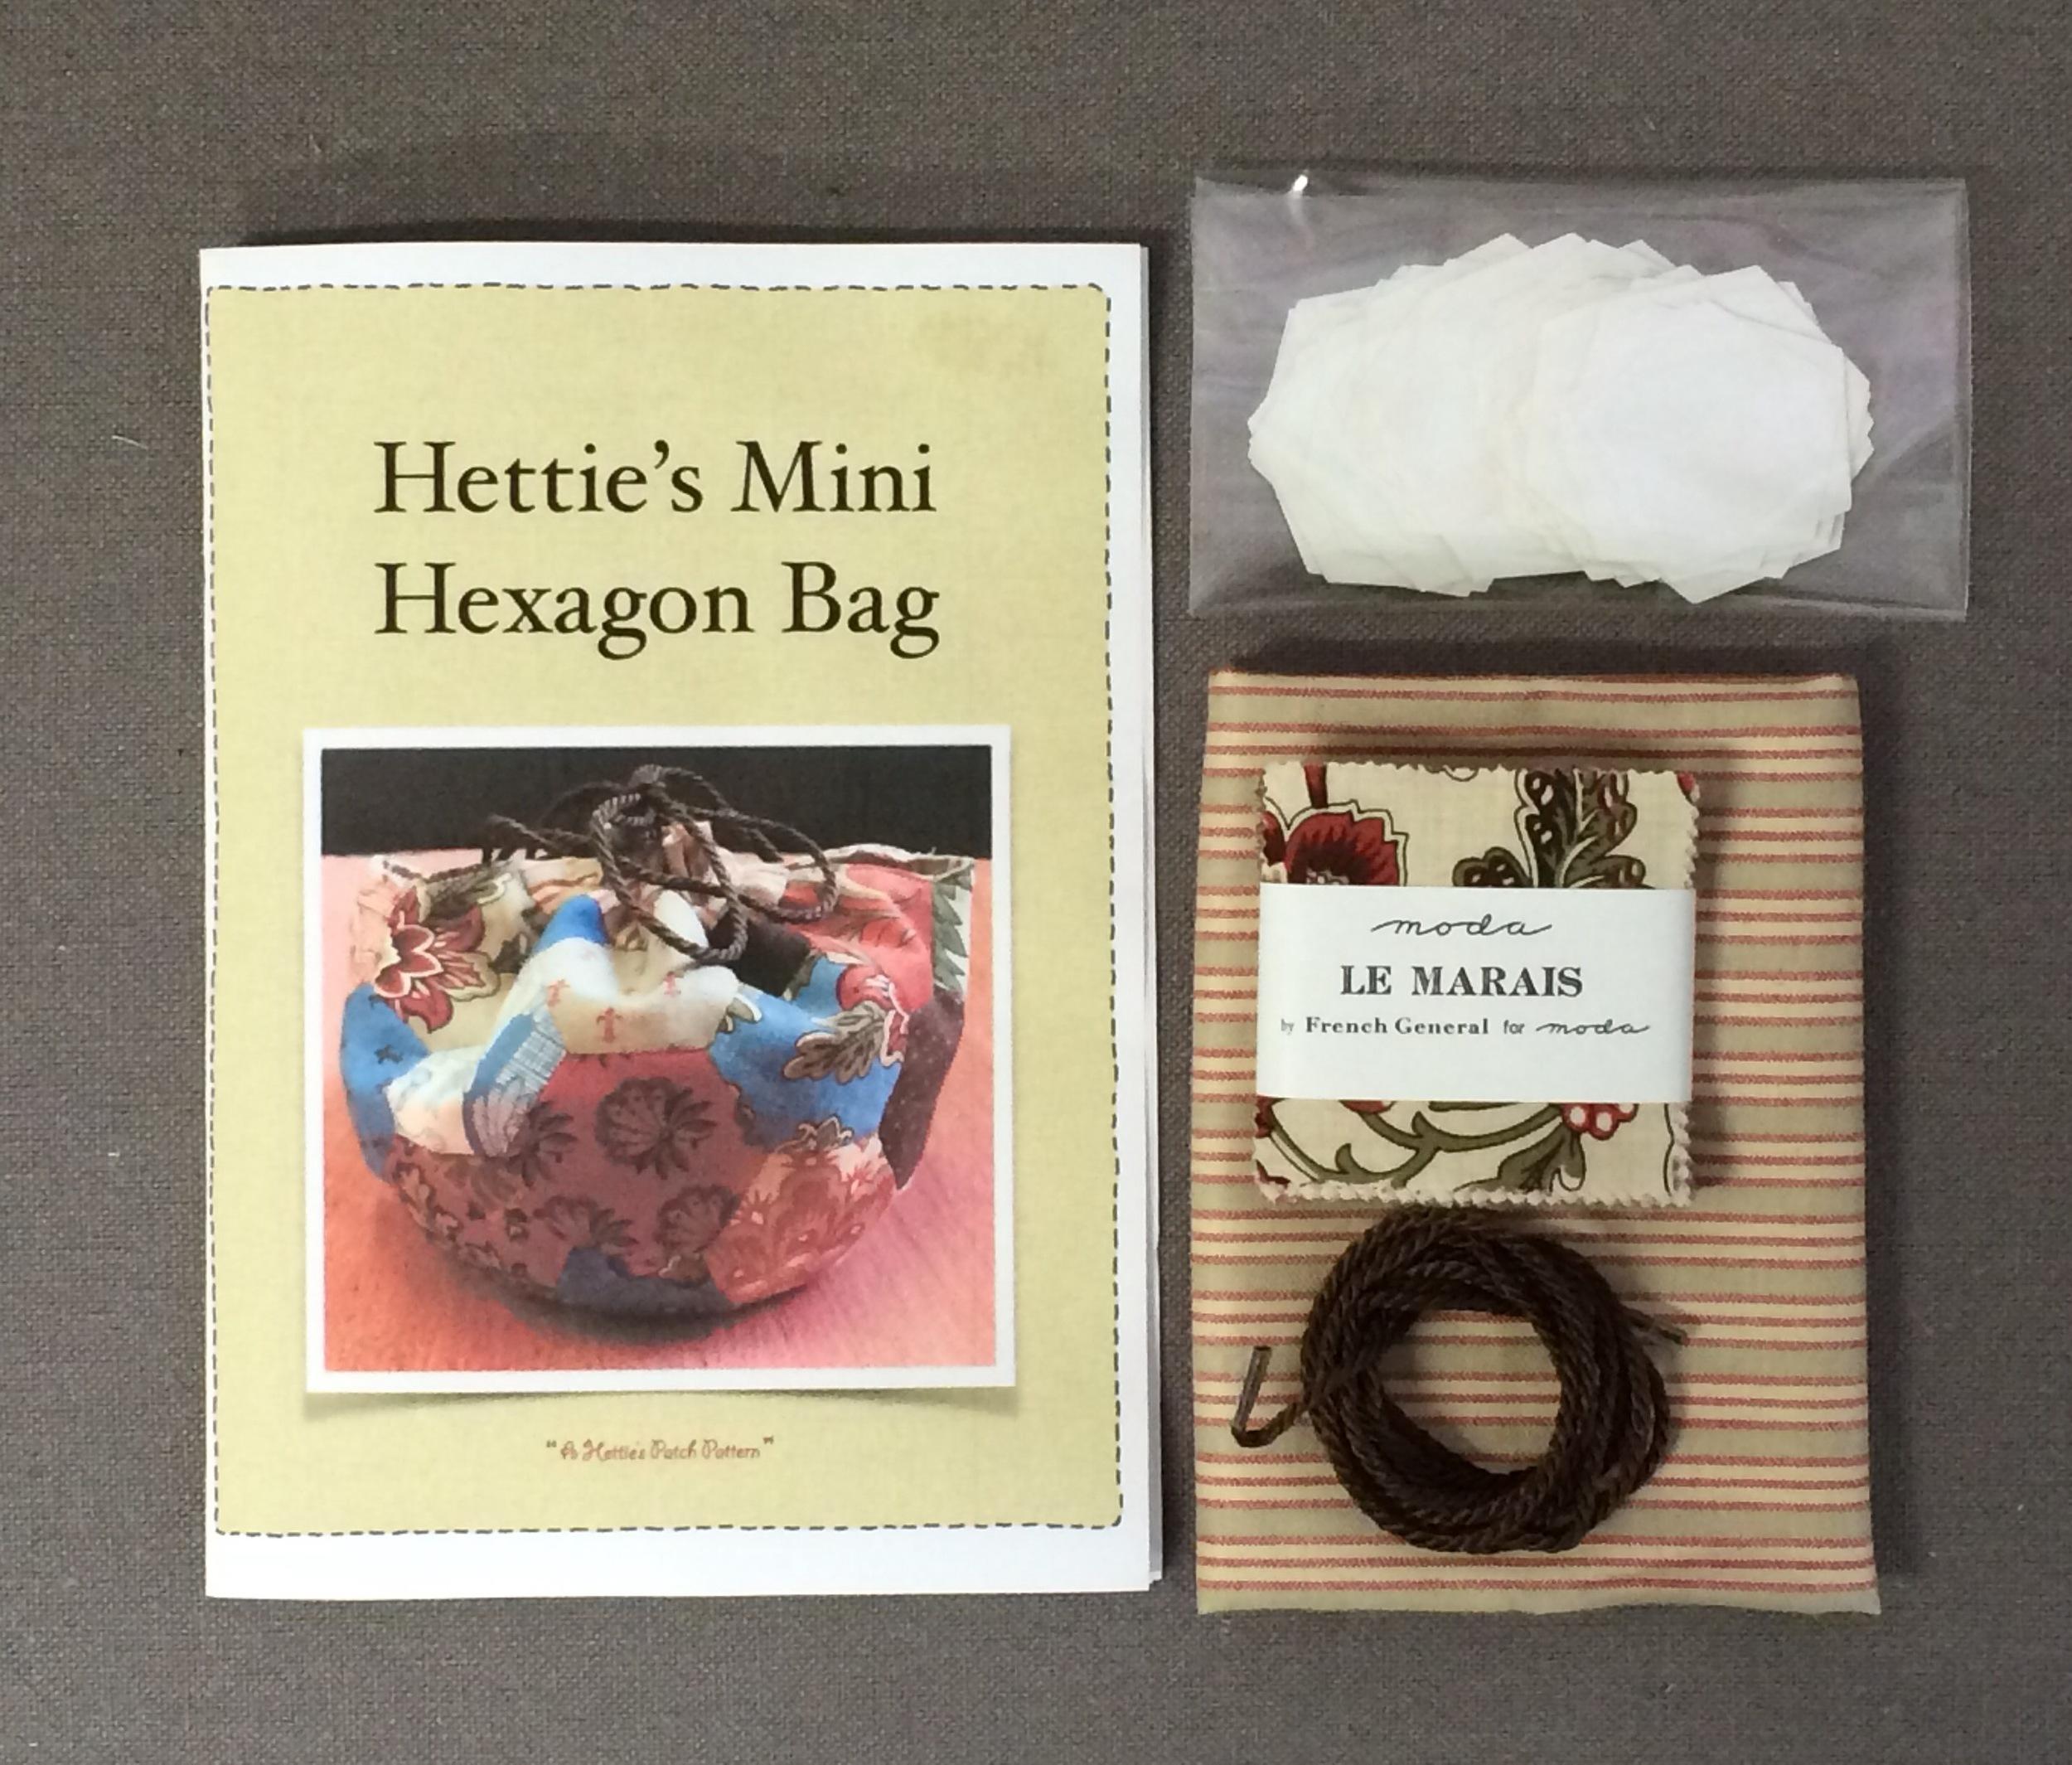 'Hettie's Mini Hexagon Bag' kit